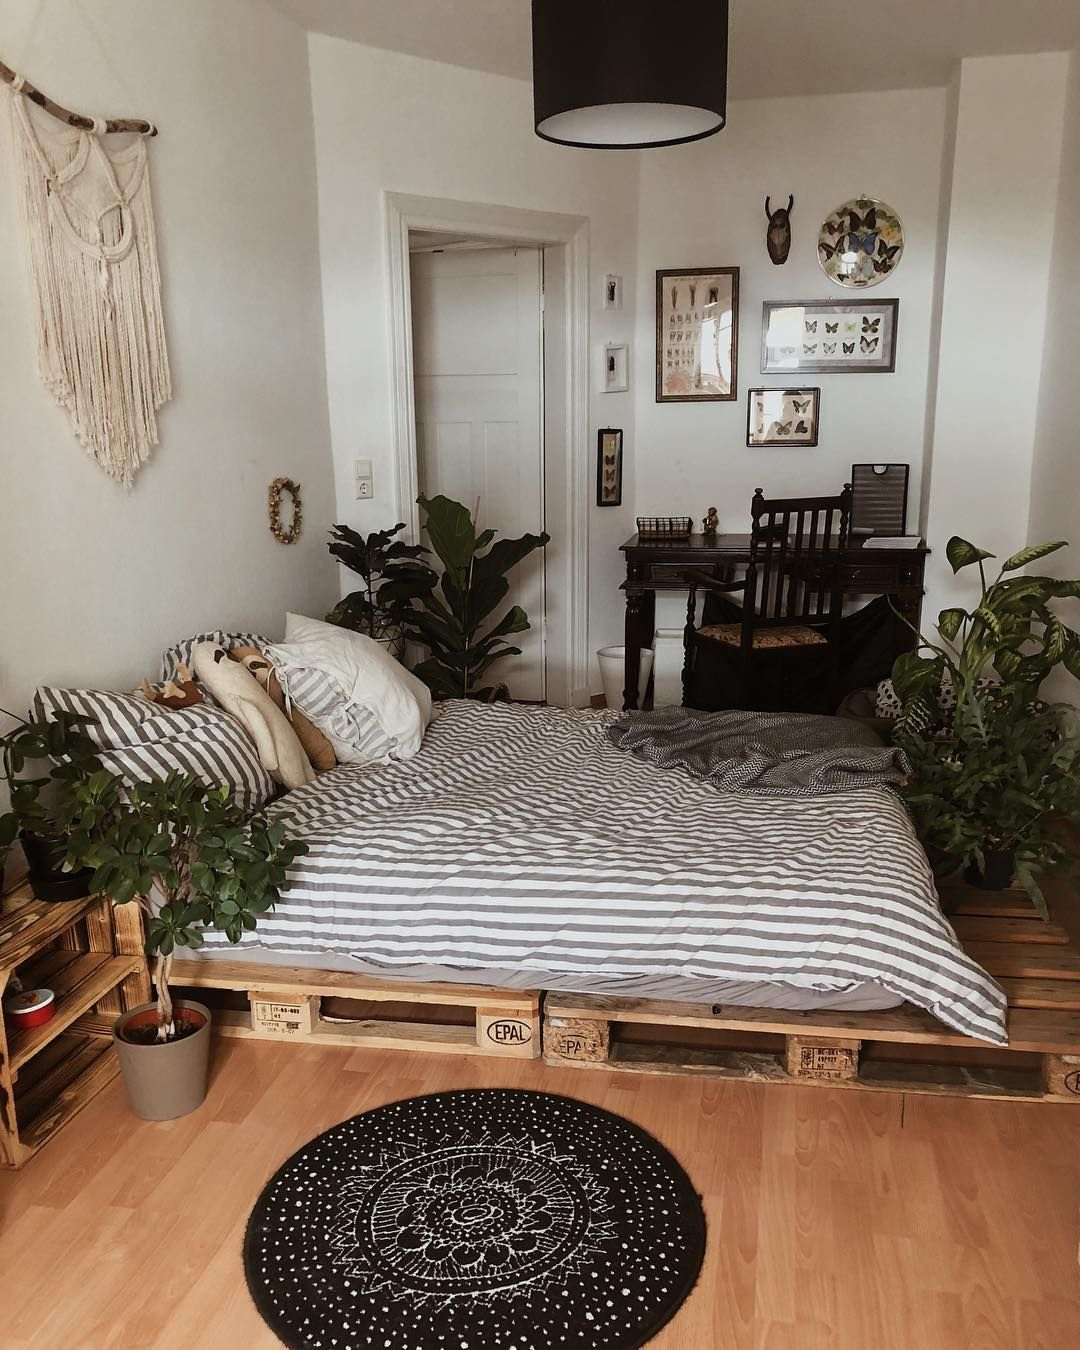 Cool Sunken Living Room Ideas For Your Dreamed House: Kleiner Dschungel ️ #home#greenliving#inspiration#urbanjungle